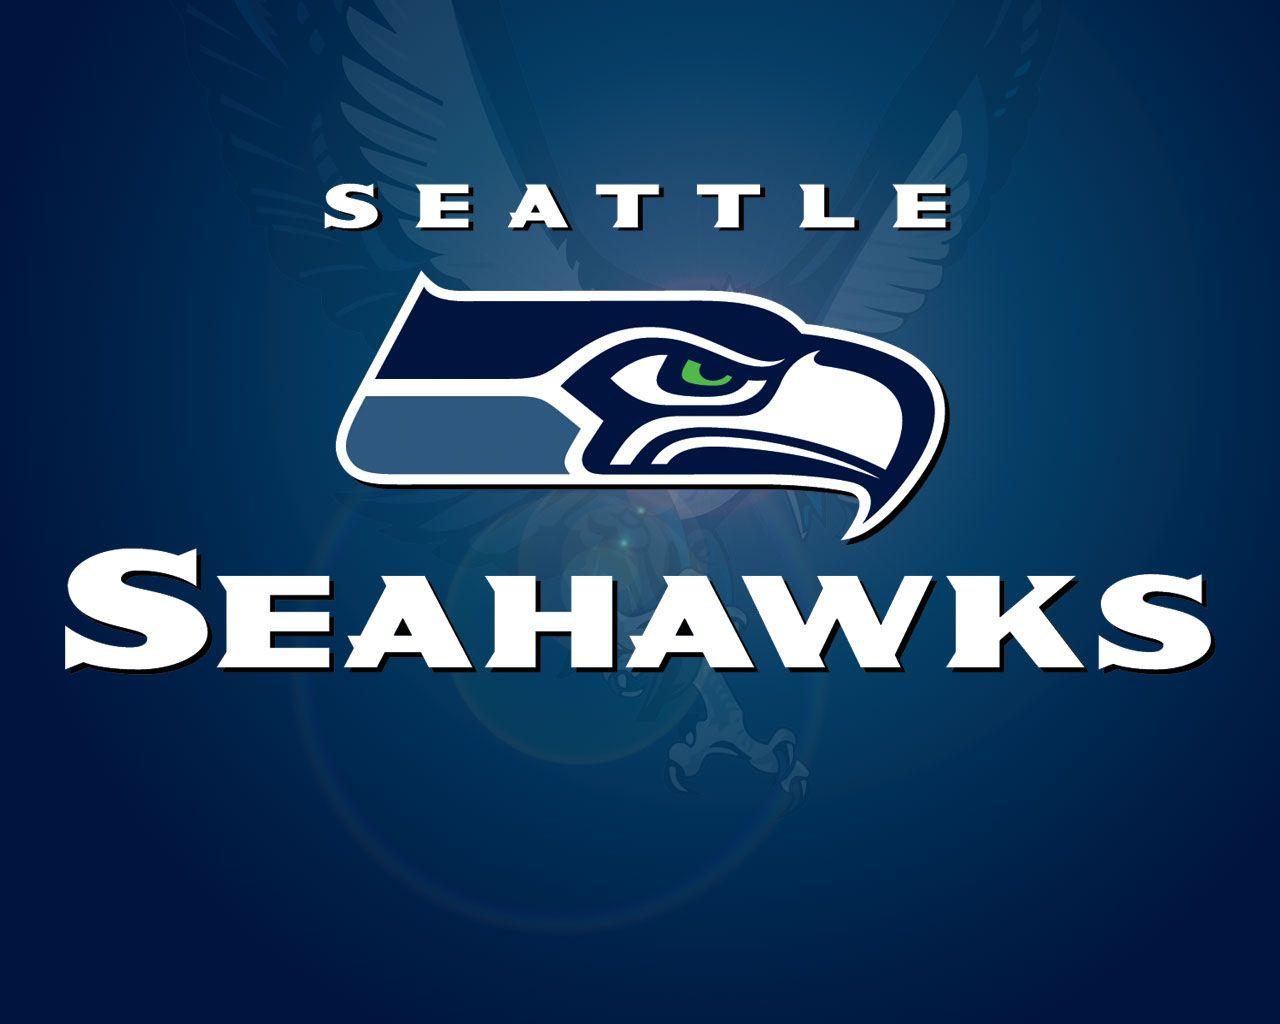 seahawks - photo #1